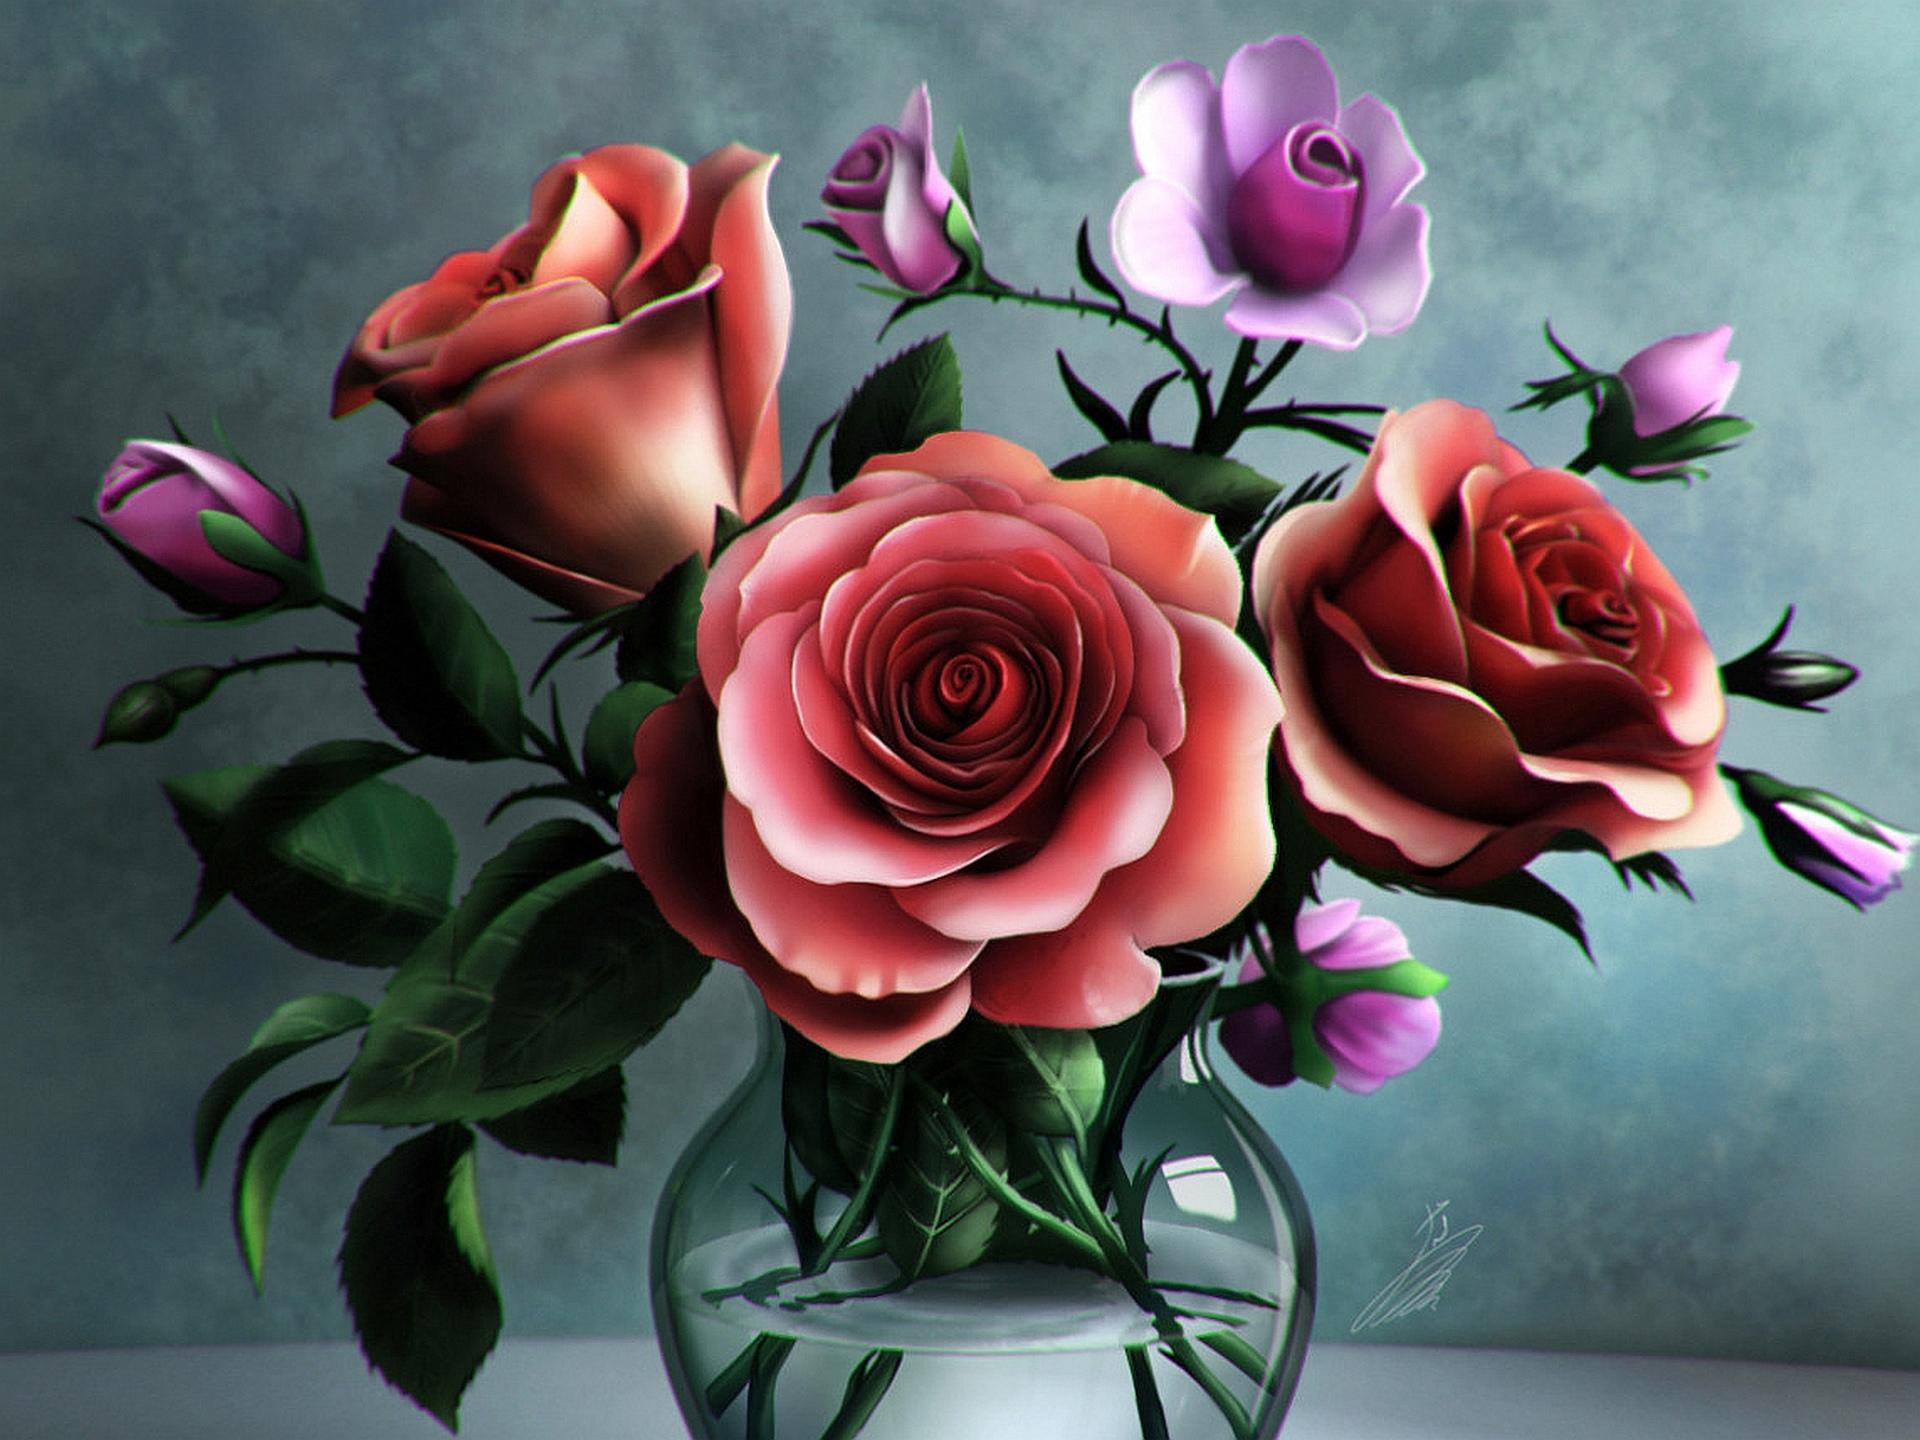 Fondos De Flores, Wallpapers HD Gratis